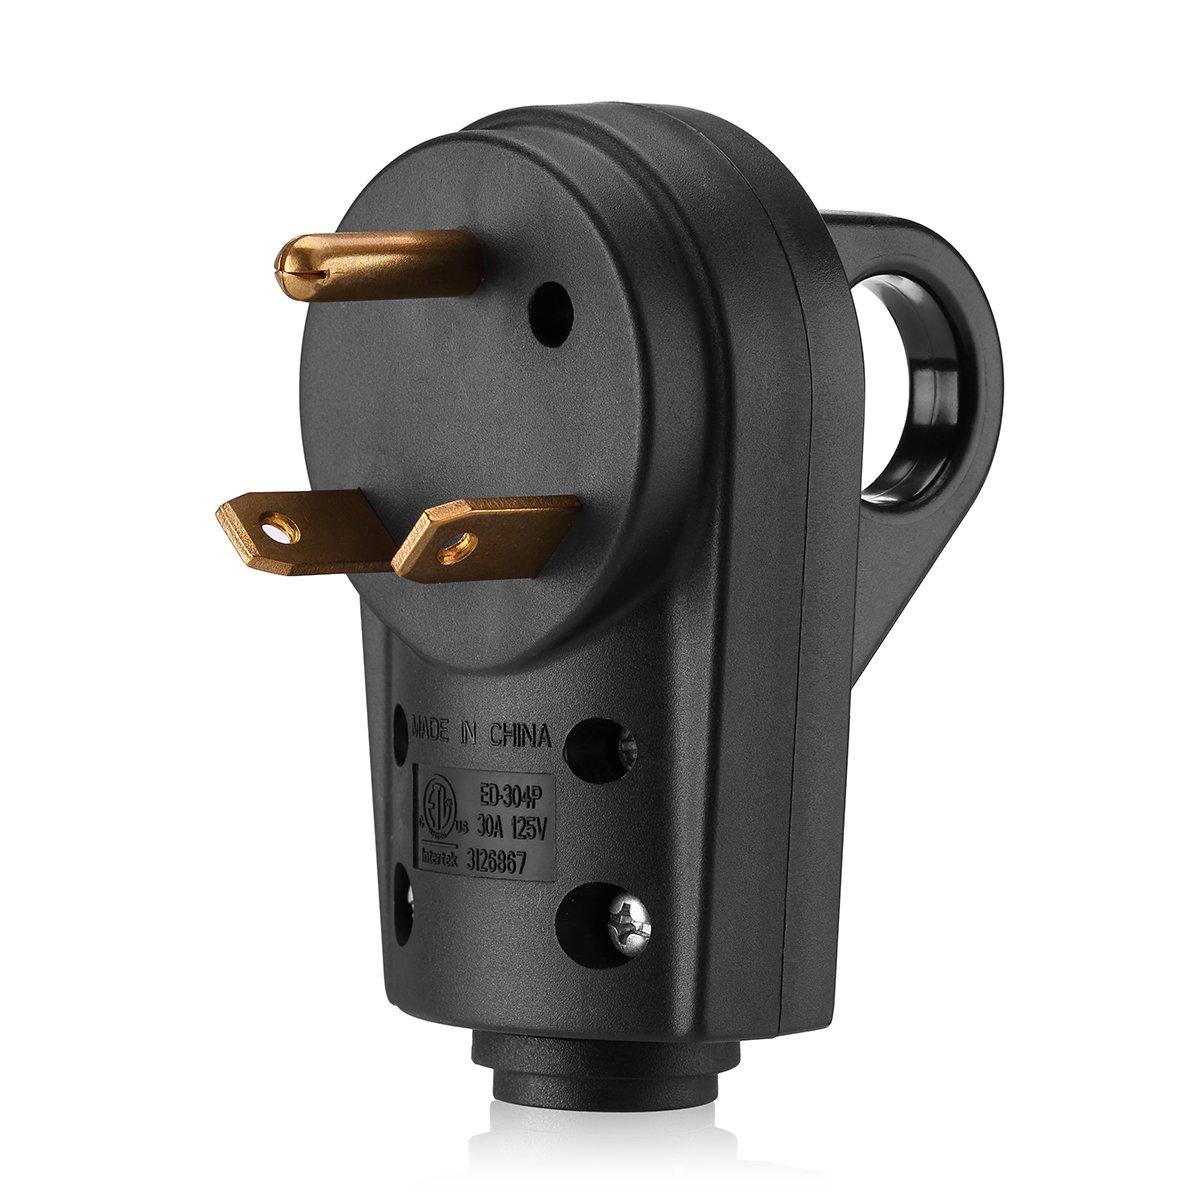 Miady 30AMP RV Replacement Female Plug with Easy Unplug Design